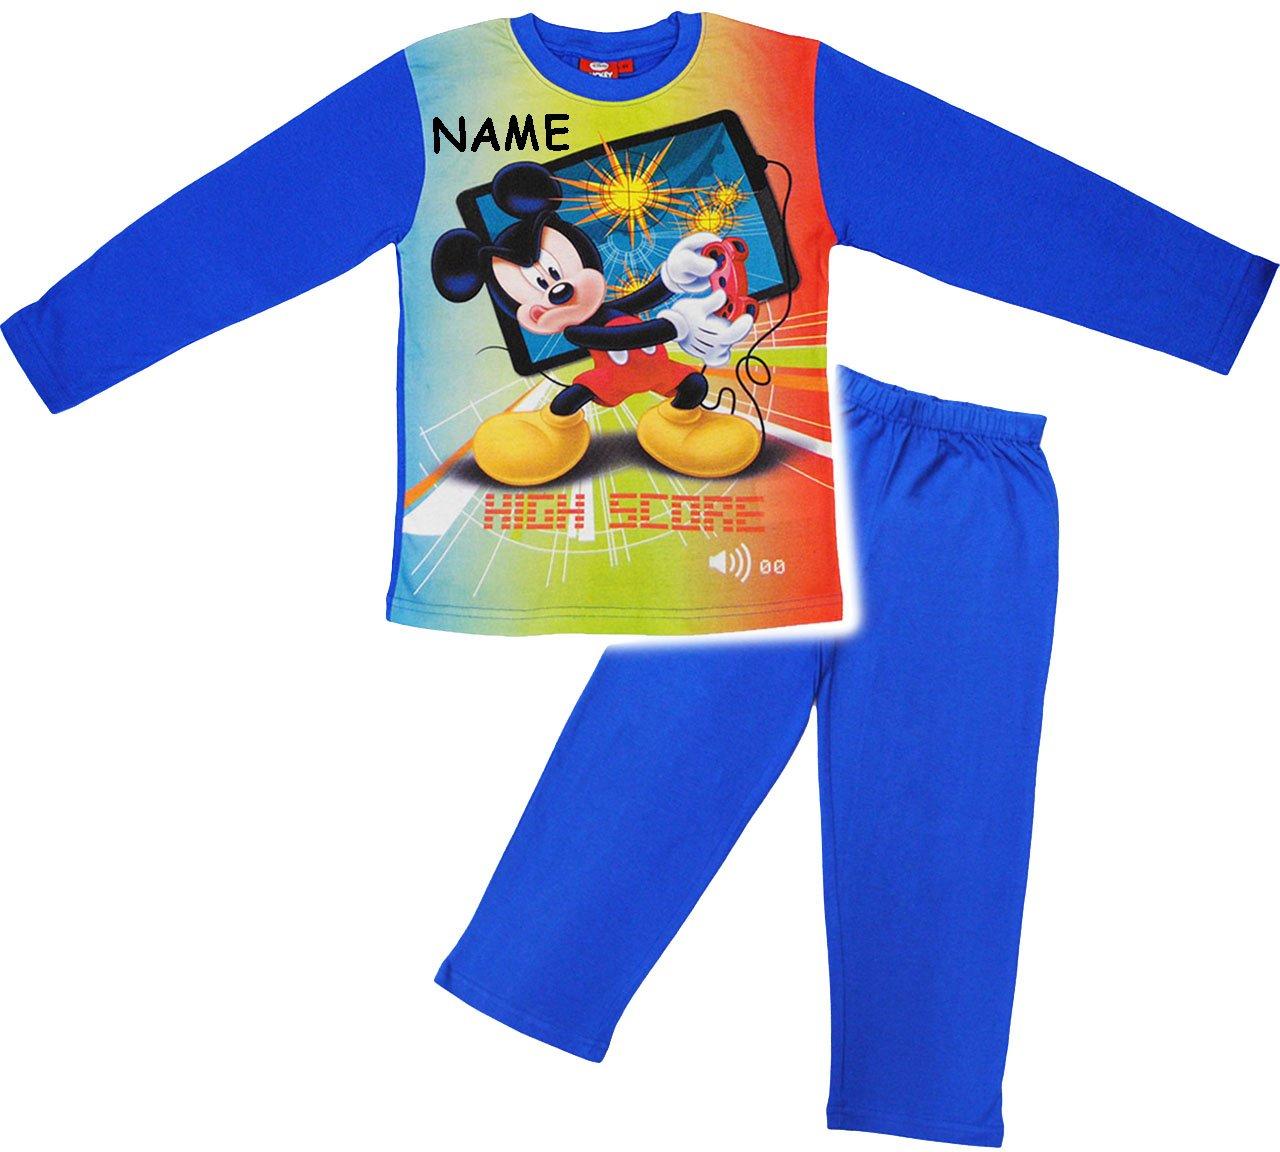 Langer Trainingsanzug // Sportanzug LAN.. Name 92 Gr alles-meine.de GmbH 2 TLG Disney Mickey Maus // Mouse Gr/ö/ße: 2 Jahre incl Set /_ Schlafanzug // Hausanzug // Pyjama